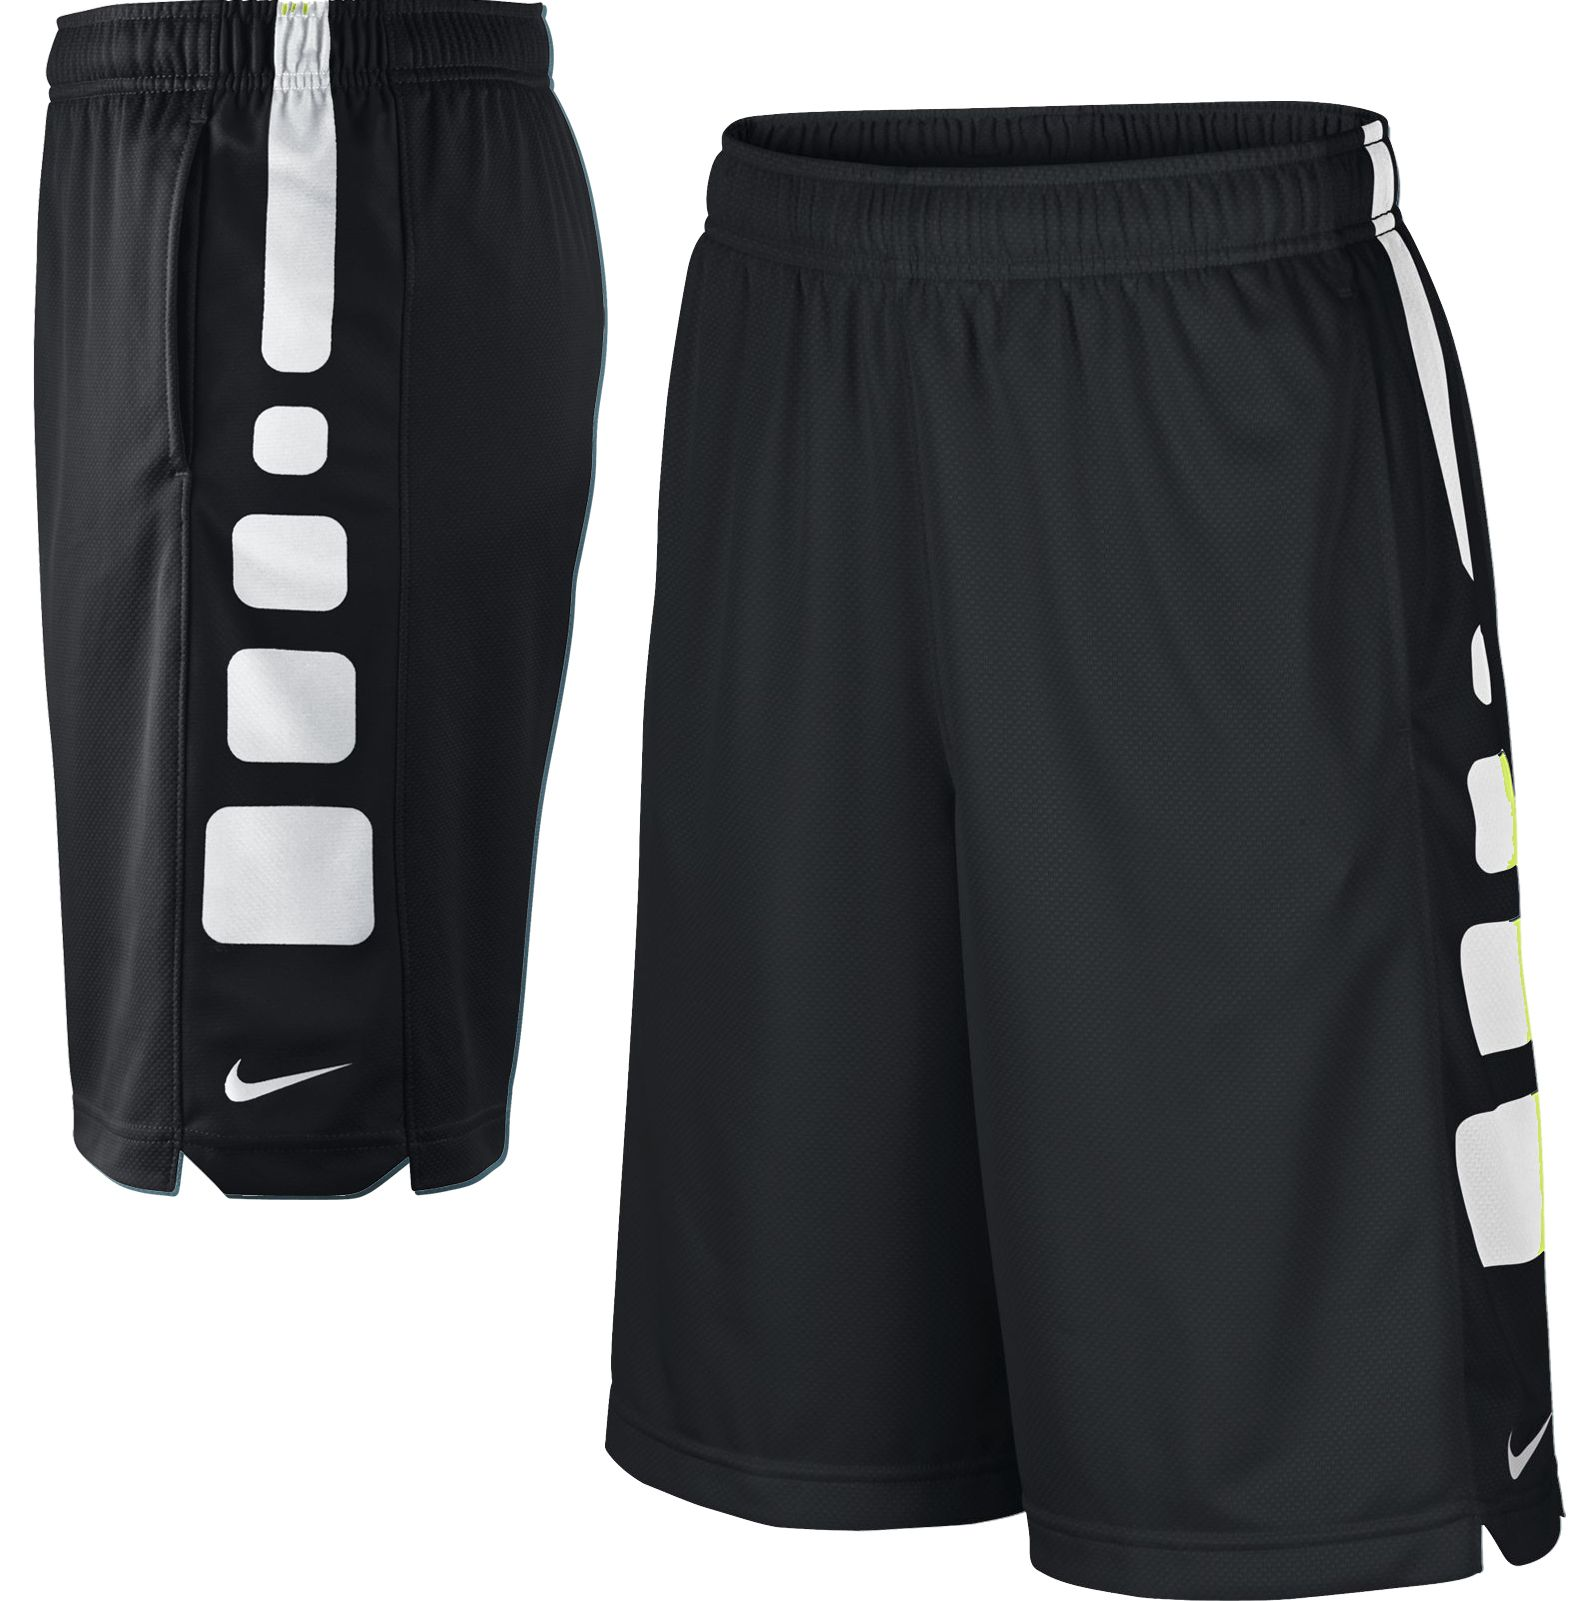 Nike Boys Elite Stripe Basketball Shorts Size Xs Black Basketball Shorts Nike Basketball Shorts Elite Shorts